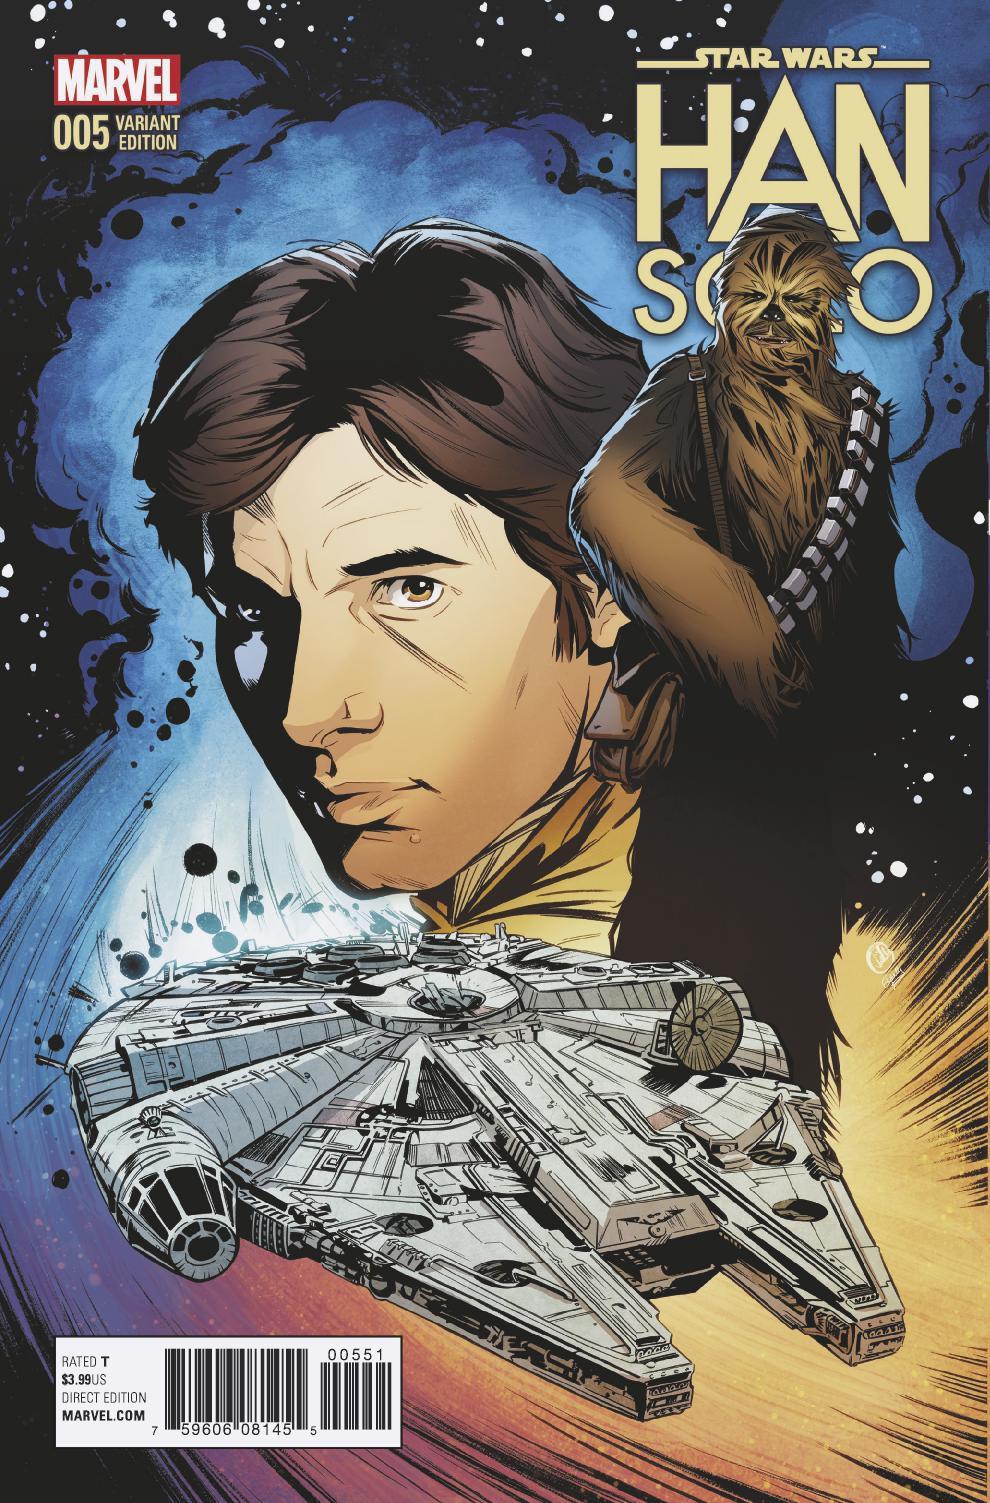 Han Solo #5 (Joëlle Jones Variant Cover) (23.11.2016)